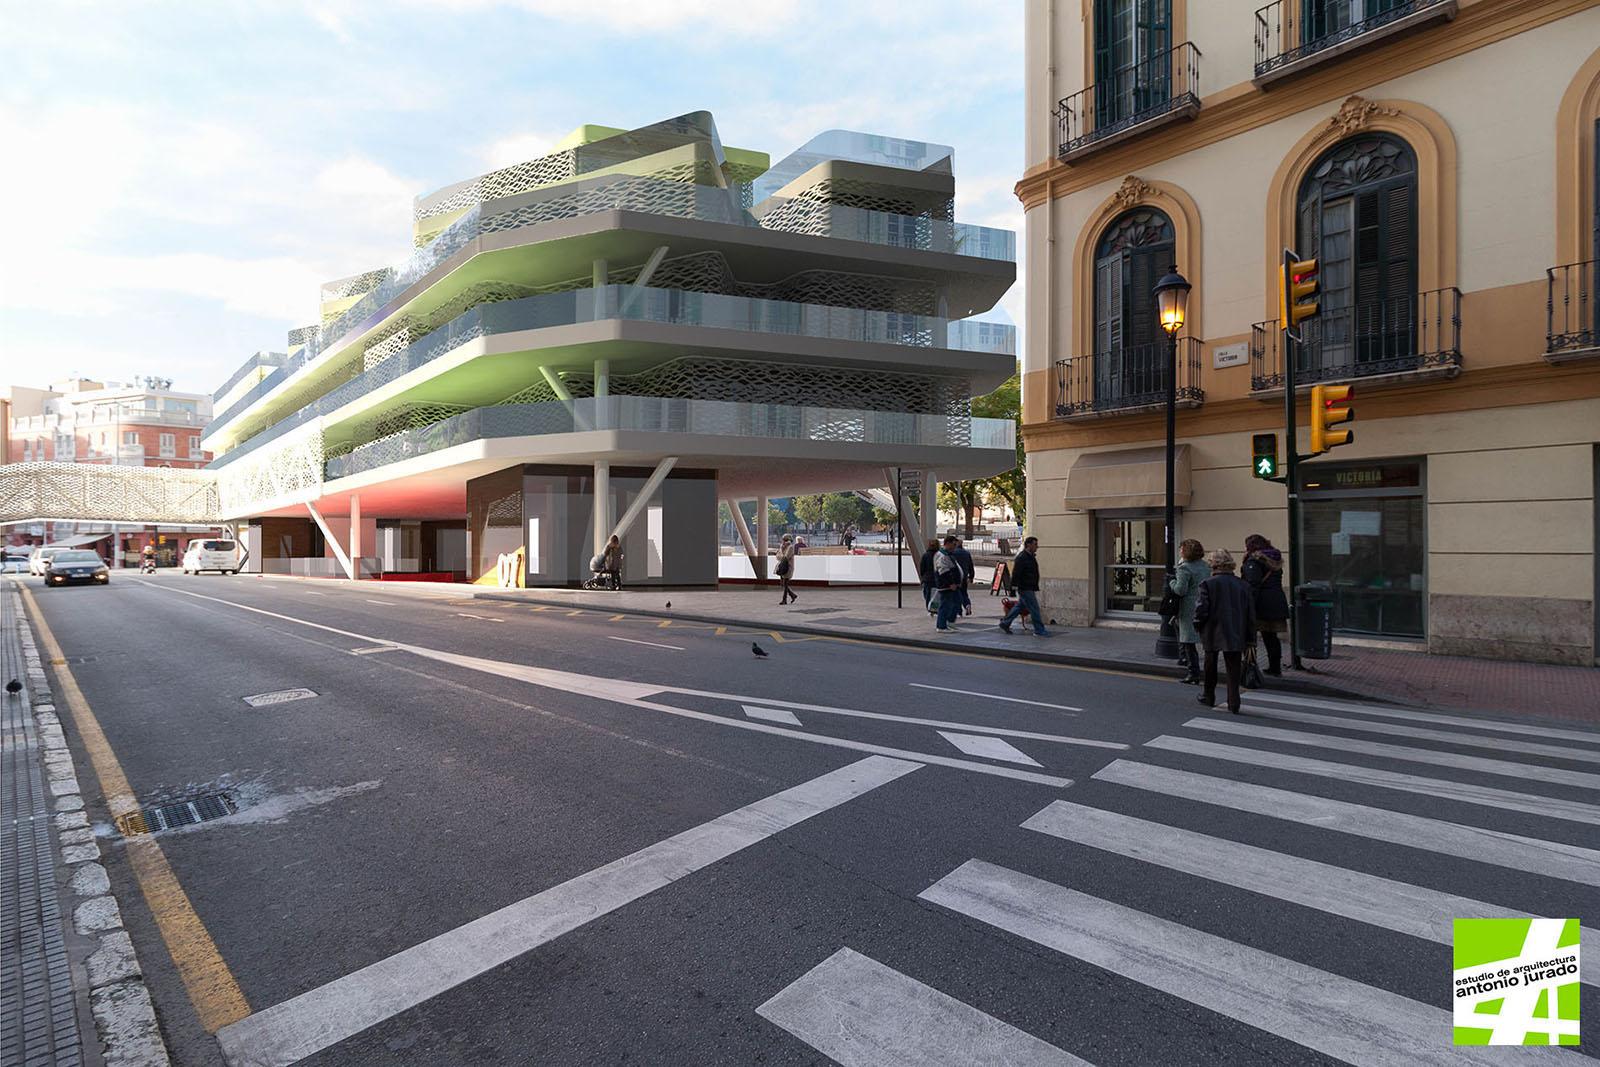 concurso-astoria-victoria-plaza-merced-malaga-antonio-jurado-arquitecto-04